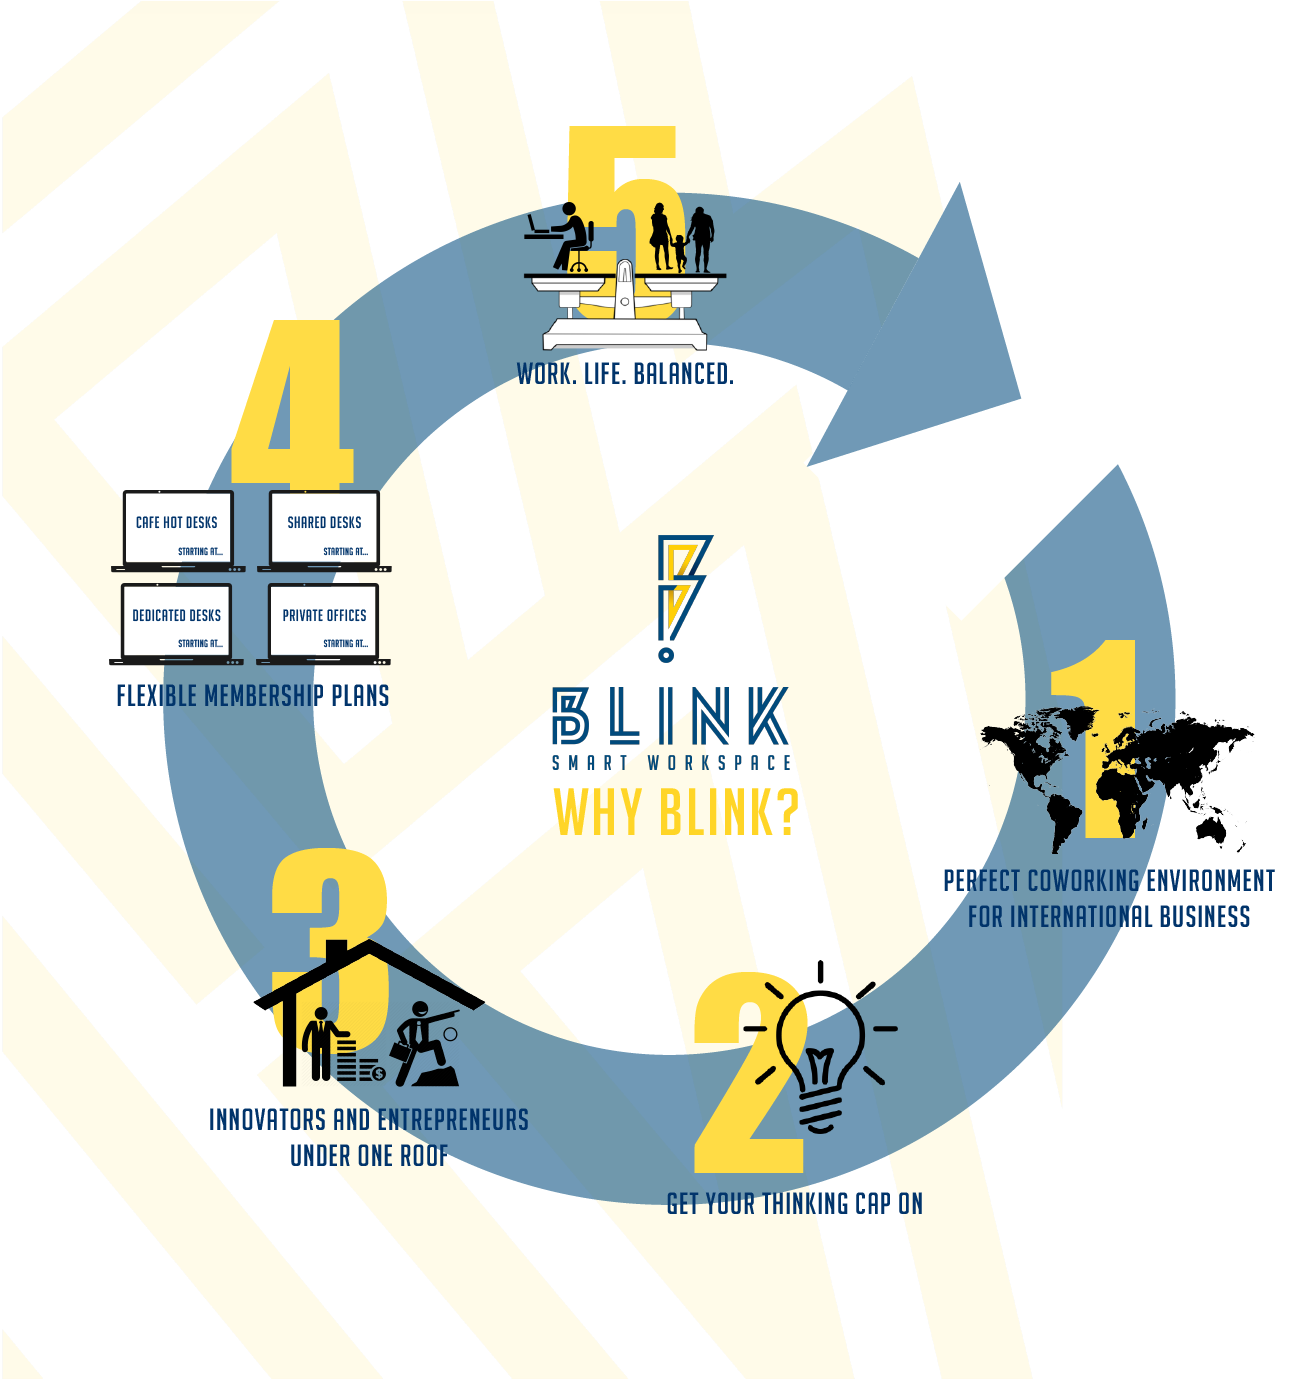 Blink - Smart Workspace, Tokyo